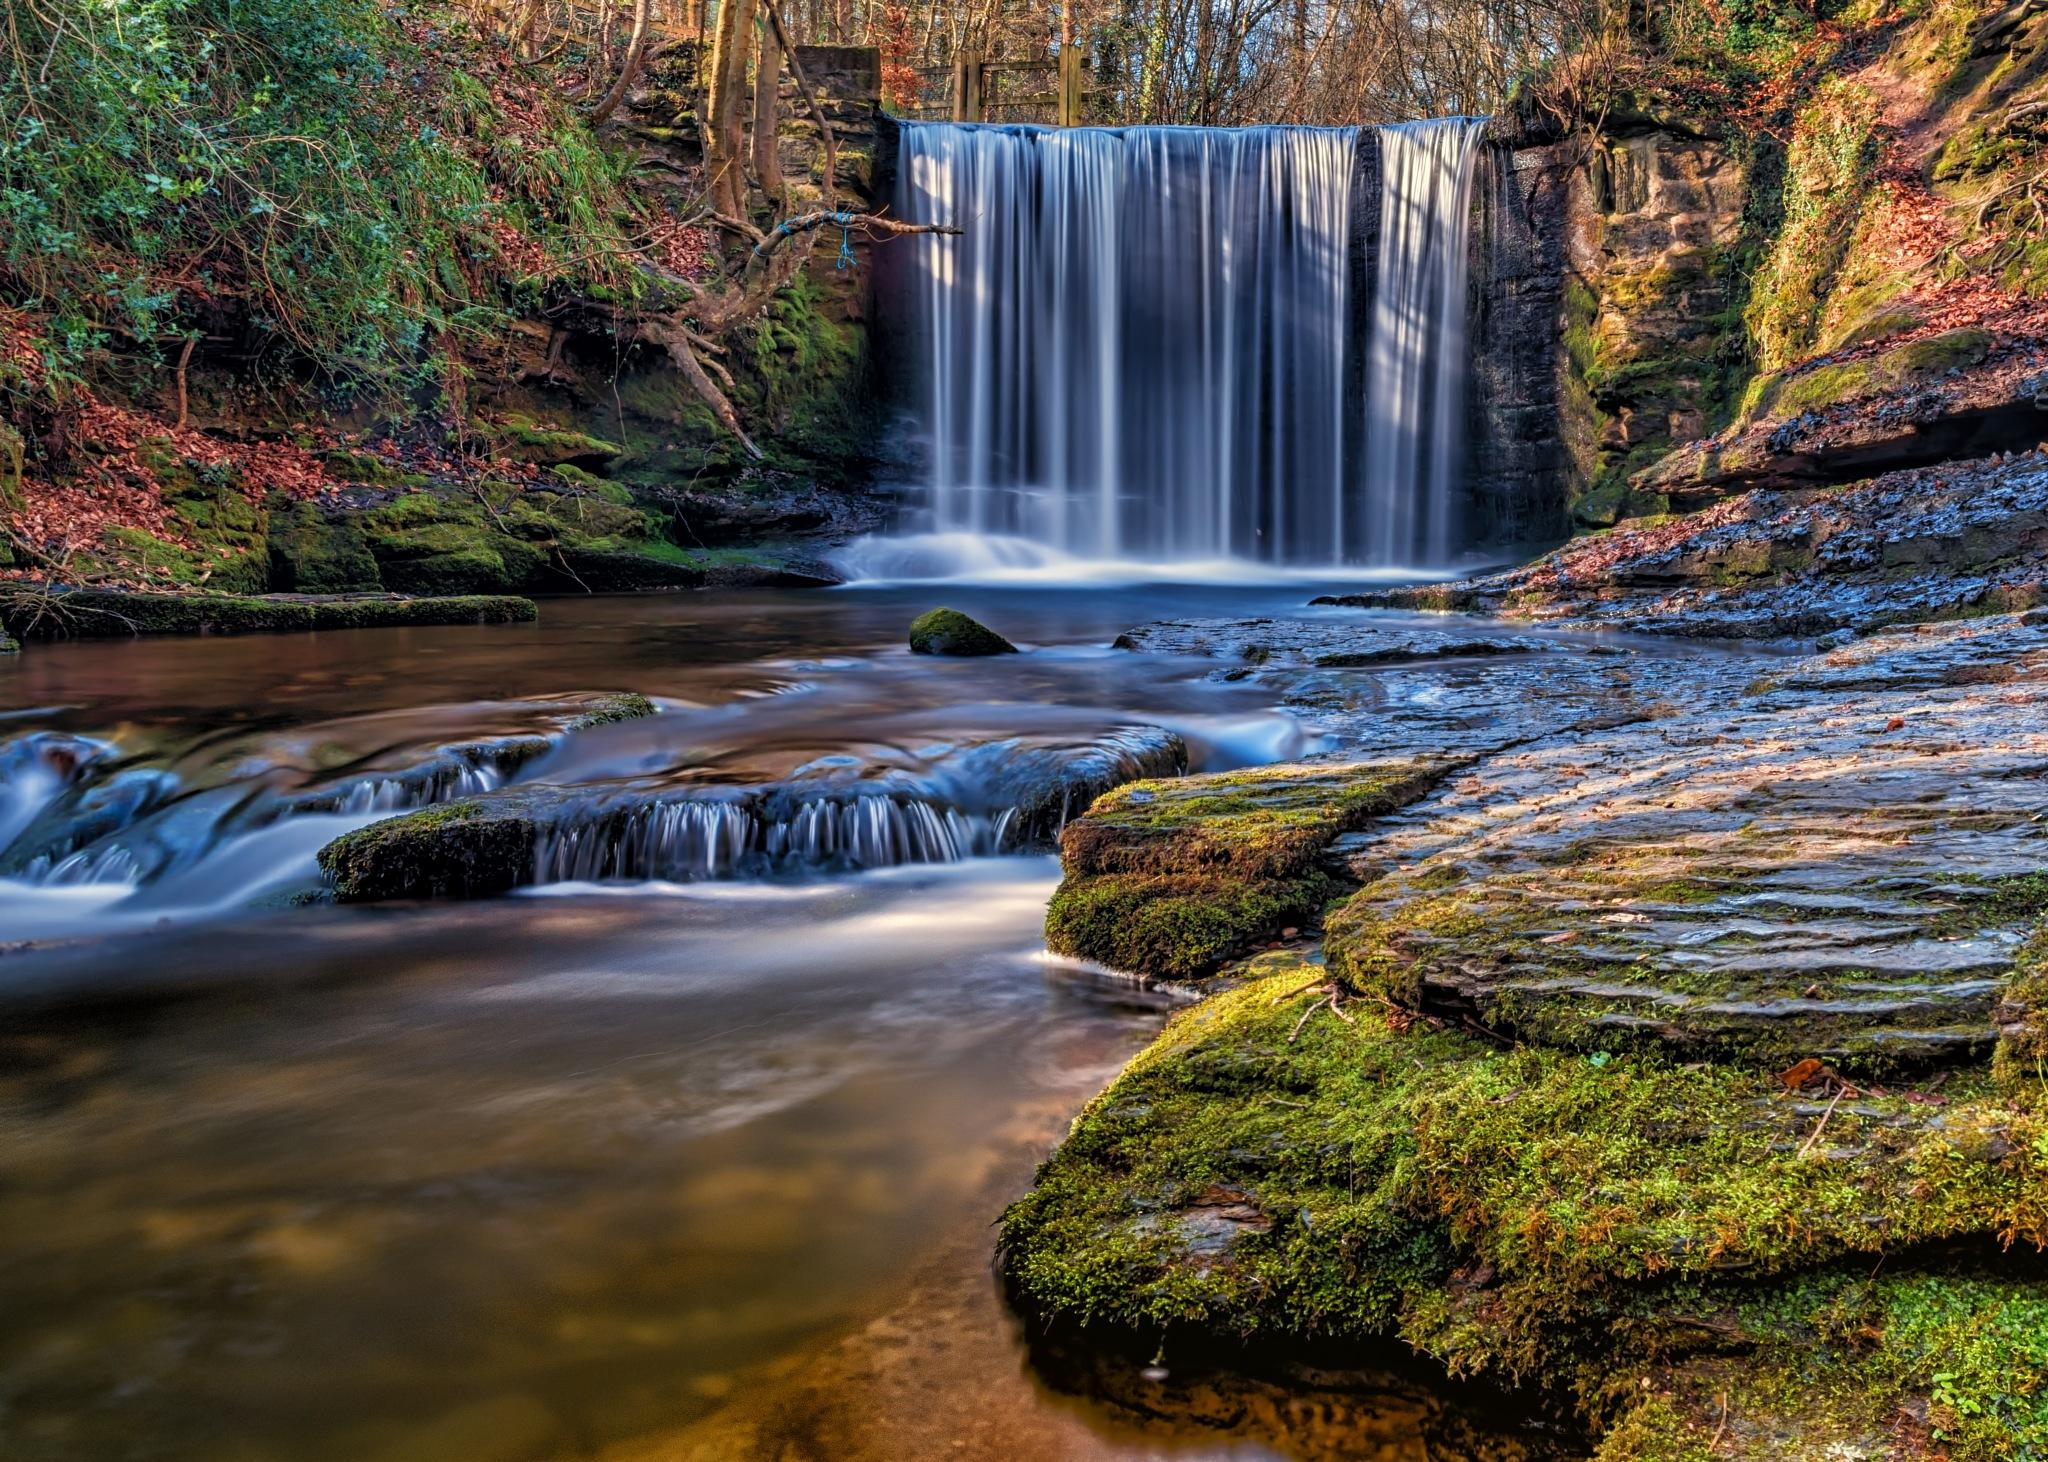 Plas Power Waterfalls by DaveJones